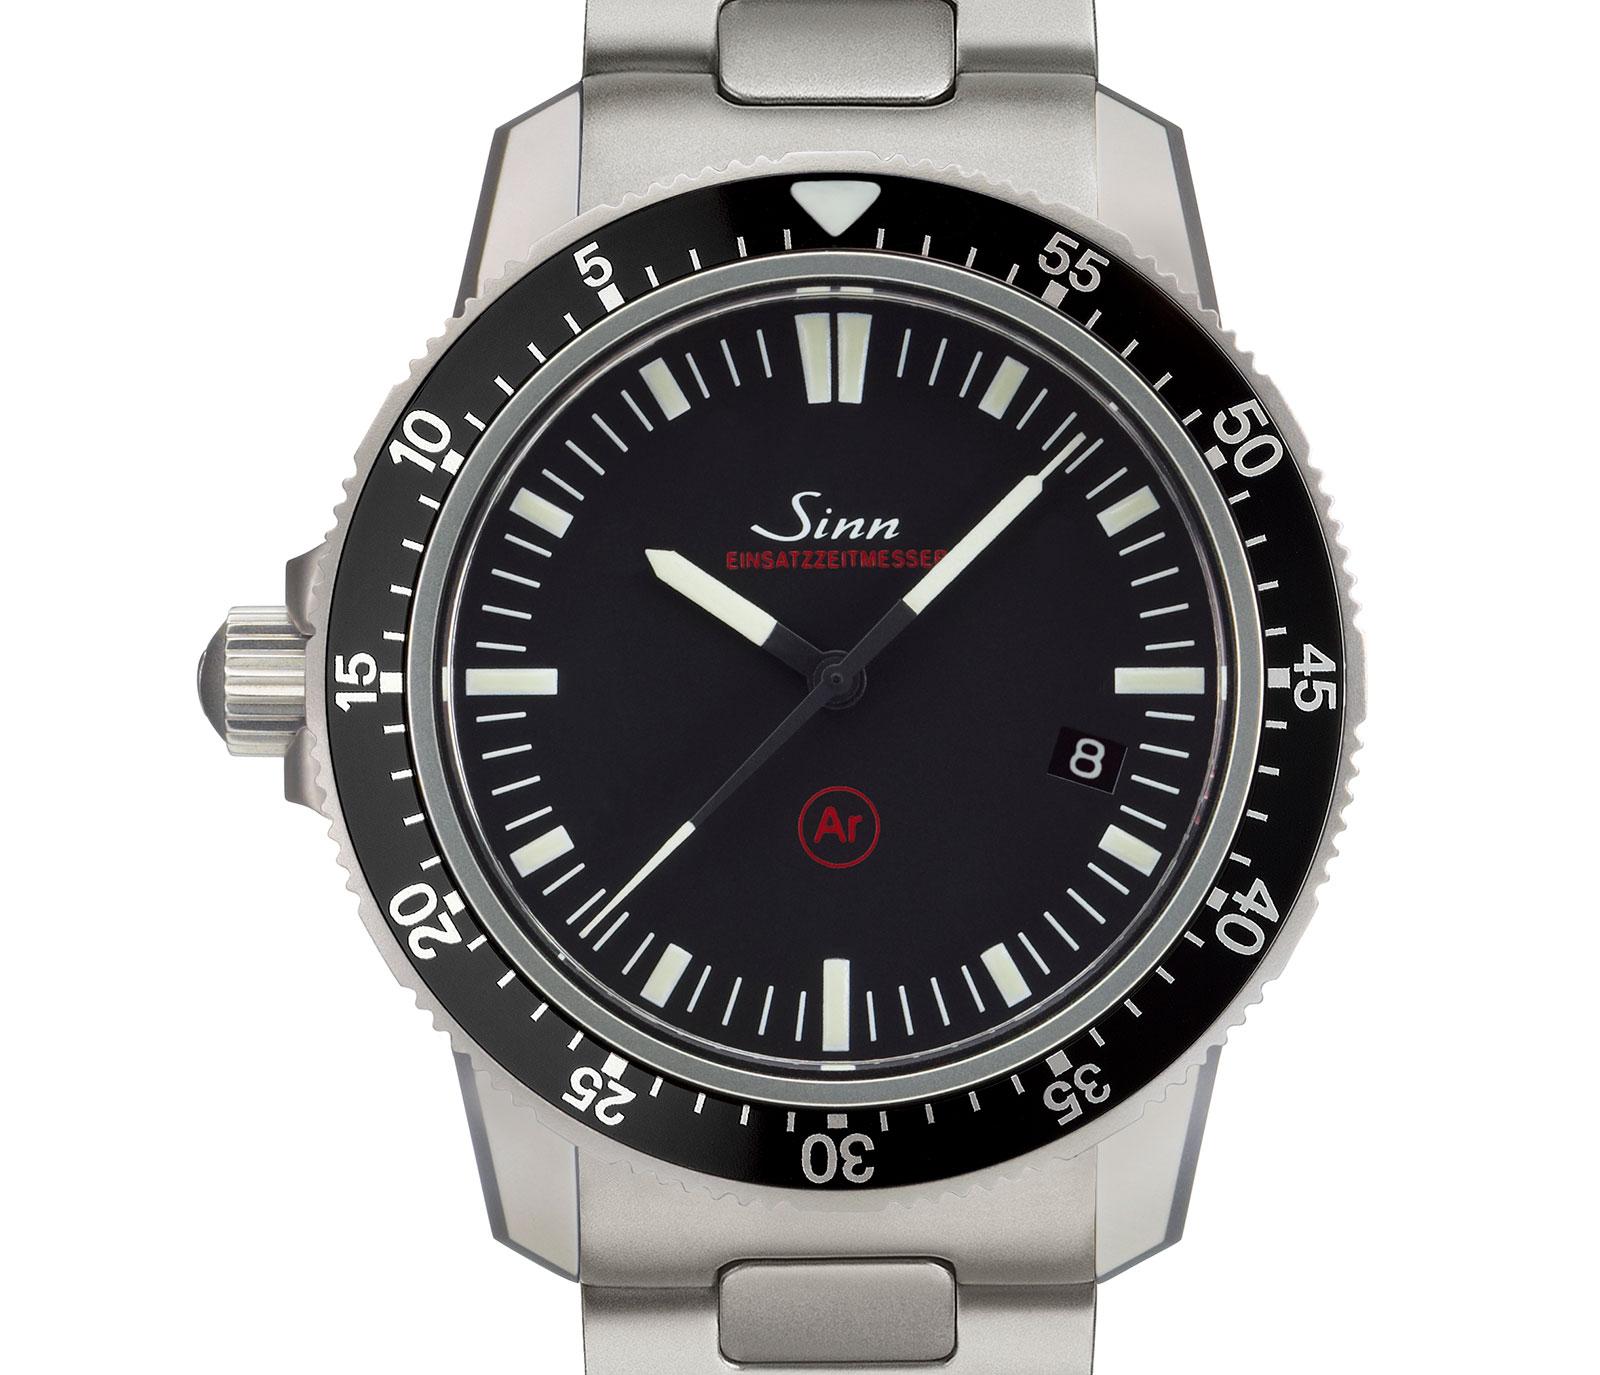 Sinn-EZM-3F-1